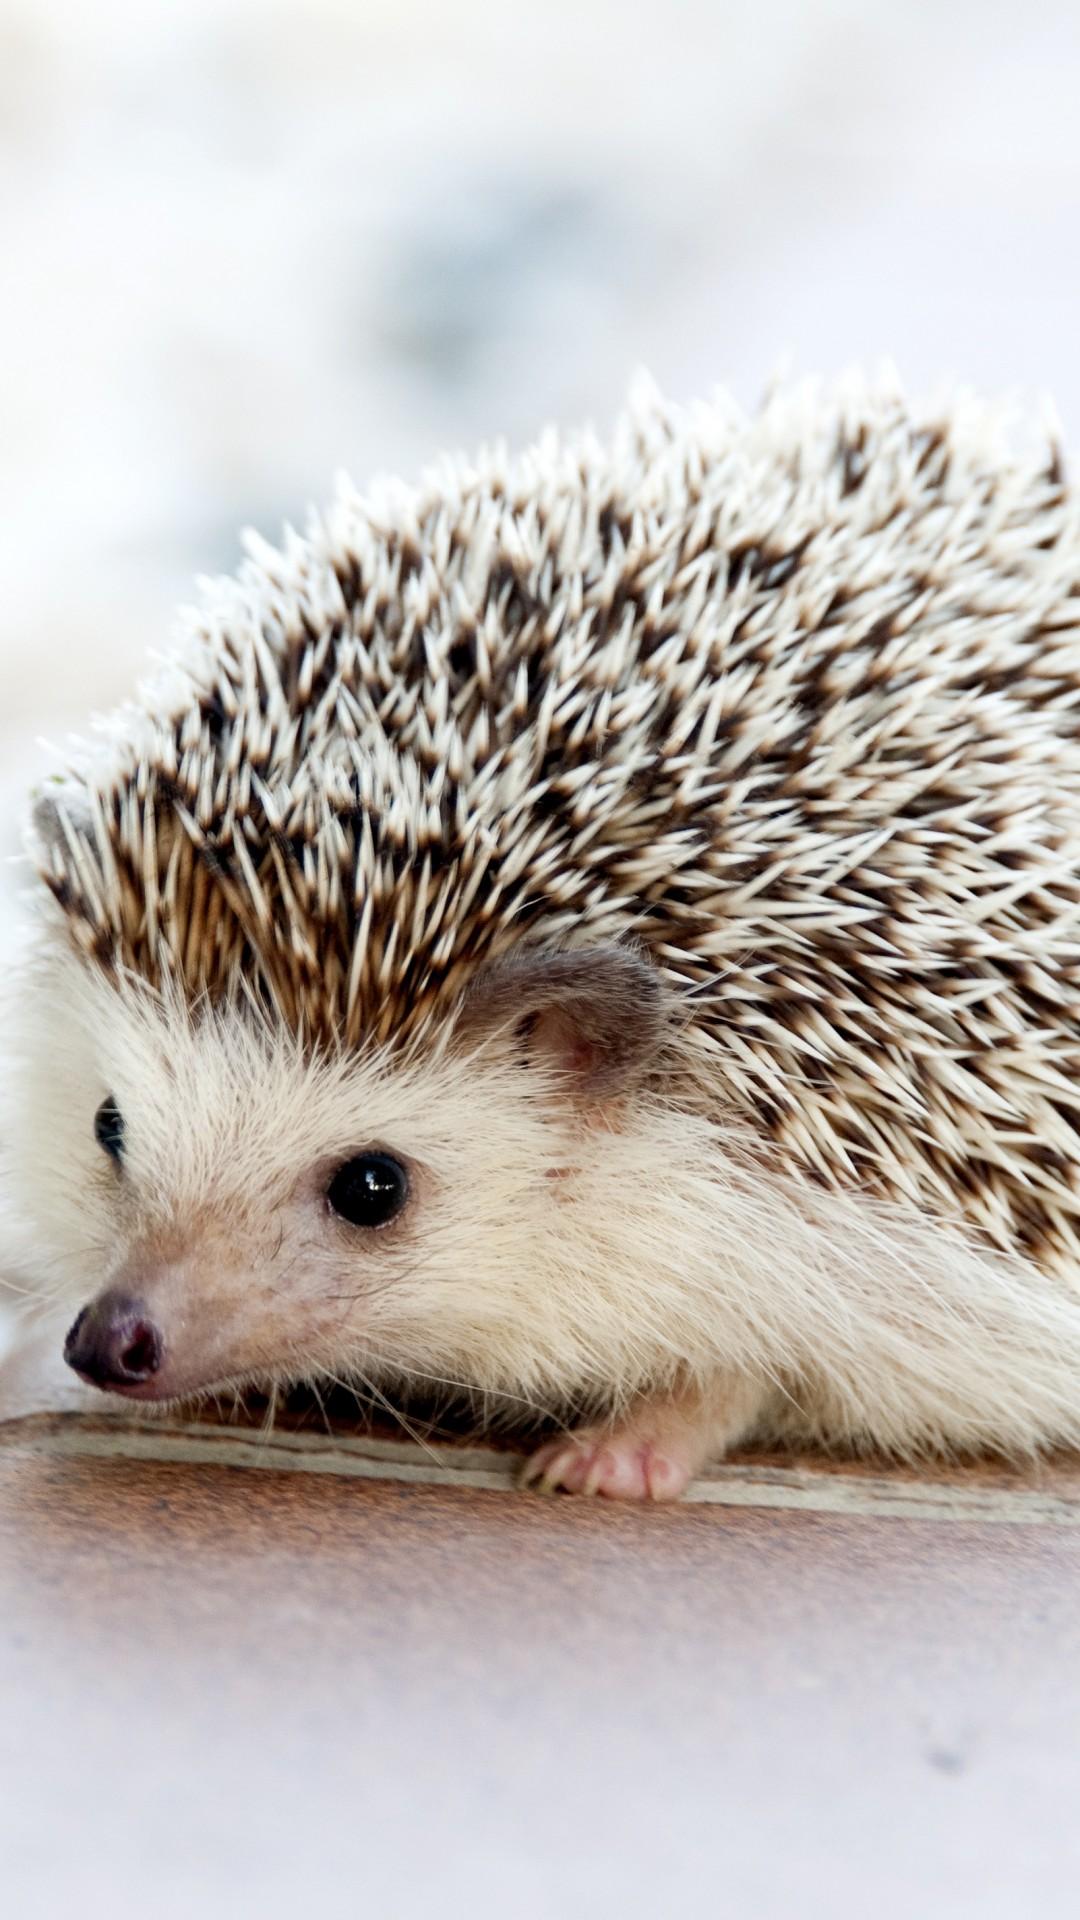 Small Wild Animals: Wallpaper Hedgehog, Cute Animals, 4k, Animals #15440